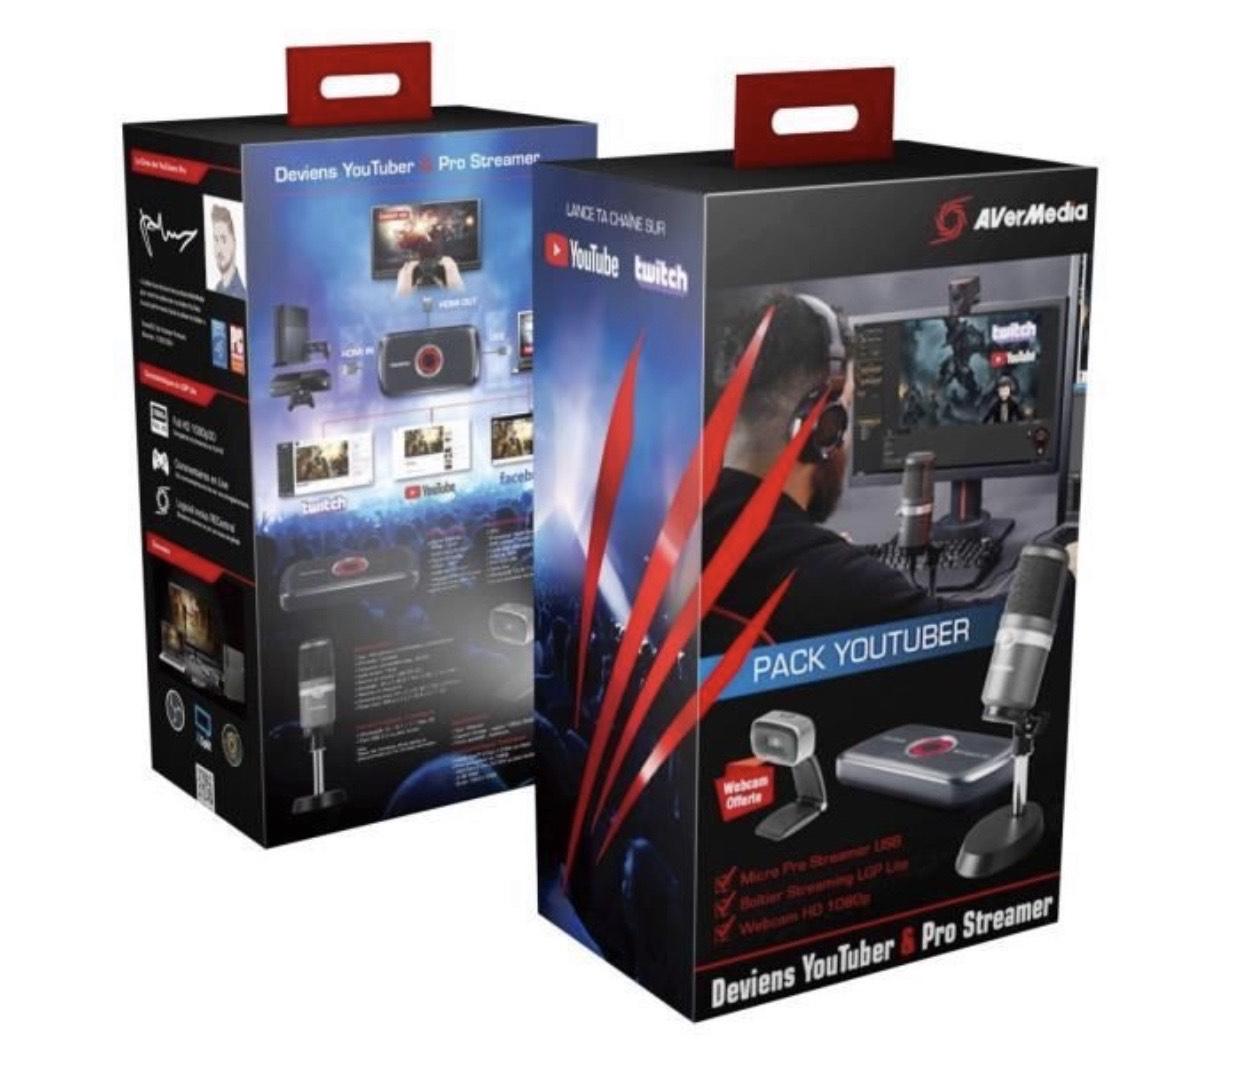 Boîtier Acquisition/Streaming Vidéo AverMedia + Micro USB Pro + Webcam Full HD 1080p